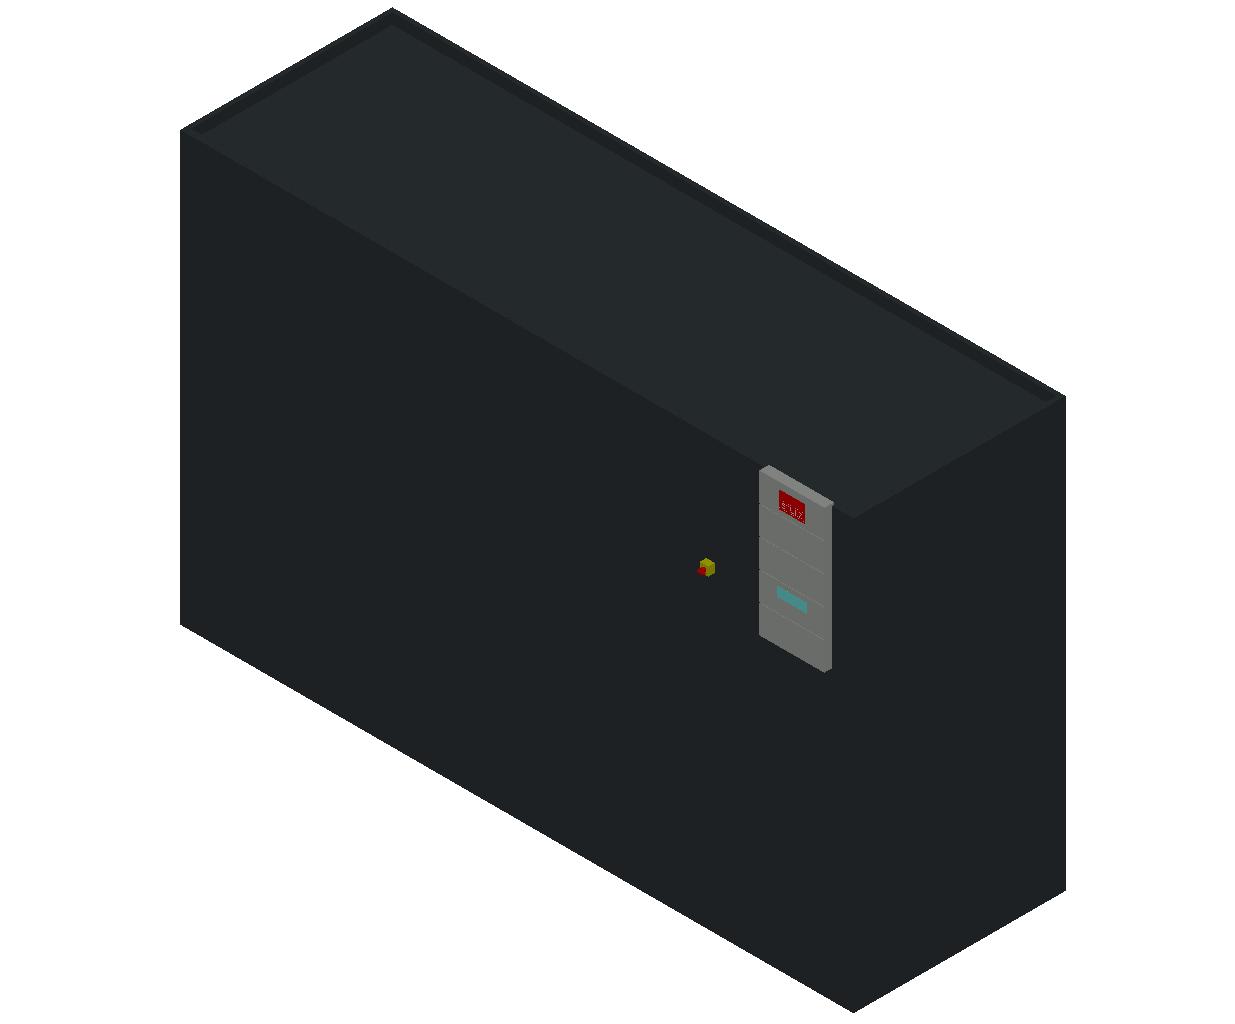 HC_Air Conditioner_Indoor Unit_MEPcontent_STULZ_CyberAir 3PRO_ALD_Dual Circuit GES_ALD_1042_GES_INT-EN.dwg